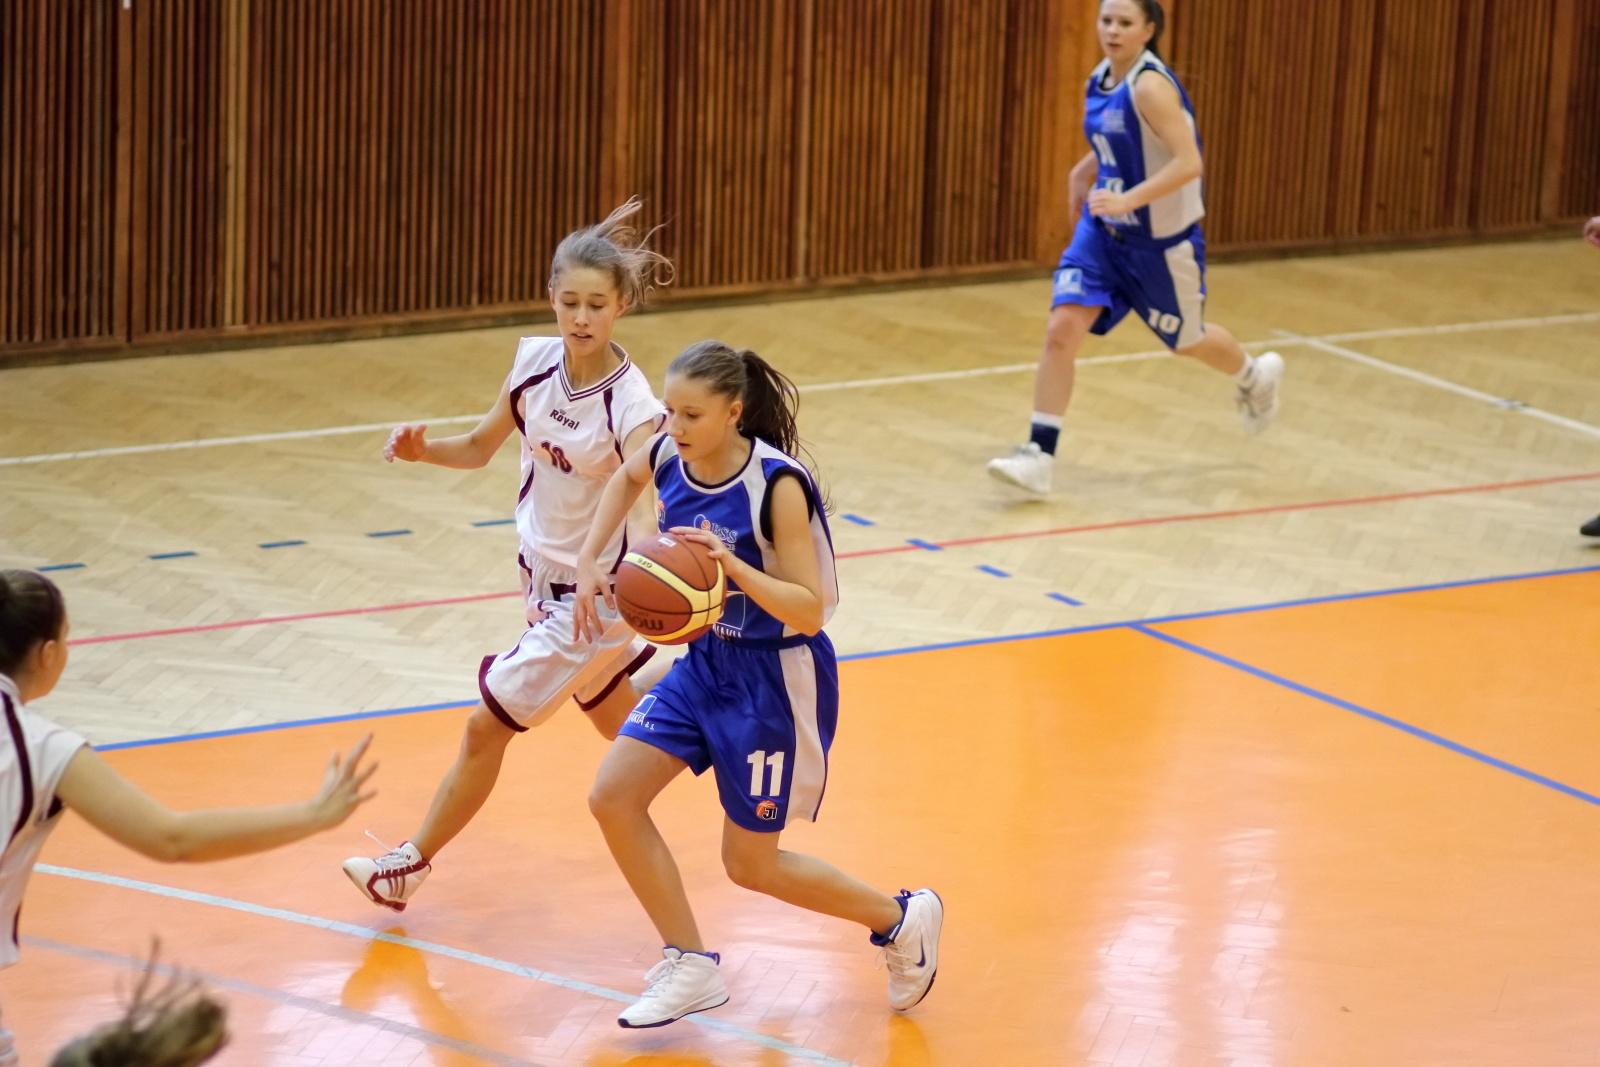 bk-zvolen-abovia-kosice-ziacky-basketbal-2011-2